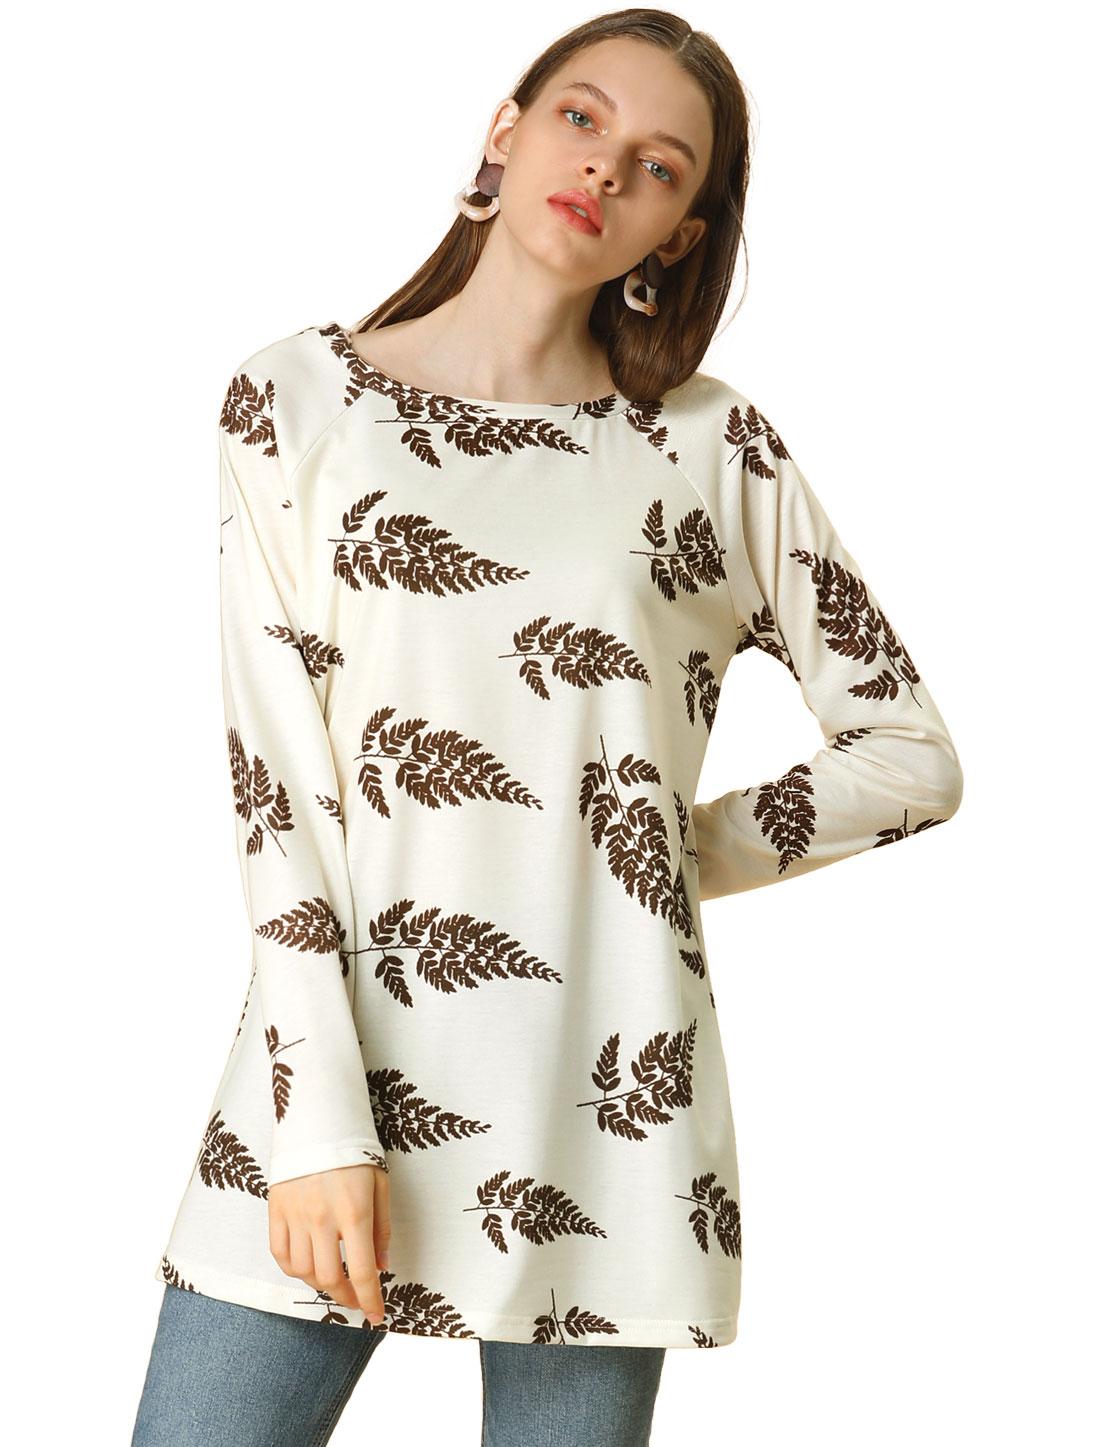 Allegra K Women's Leaf Print Raglan Loose Tunic Top Crem White XL (US 18)